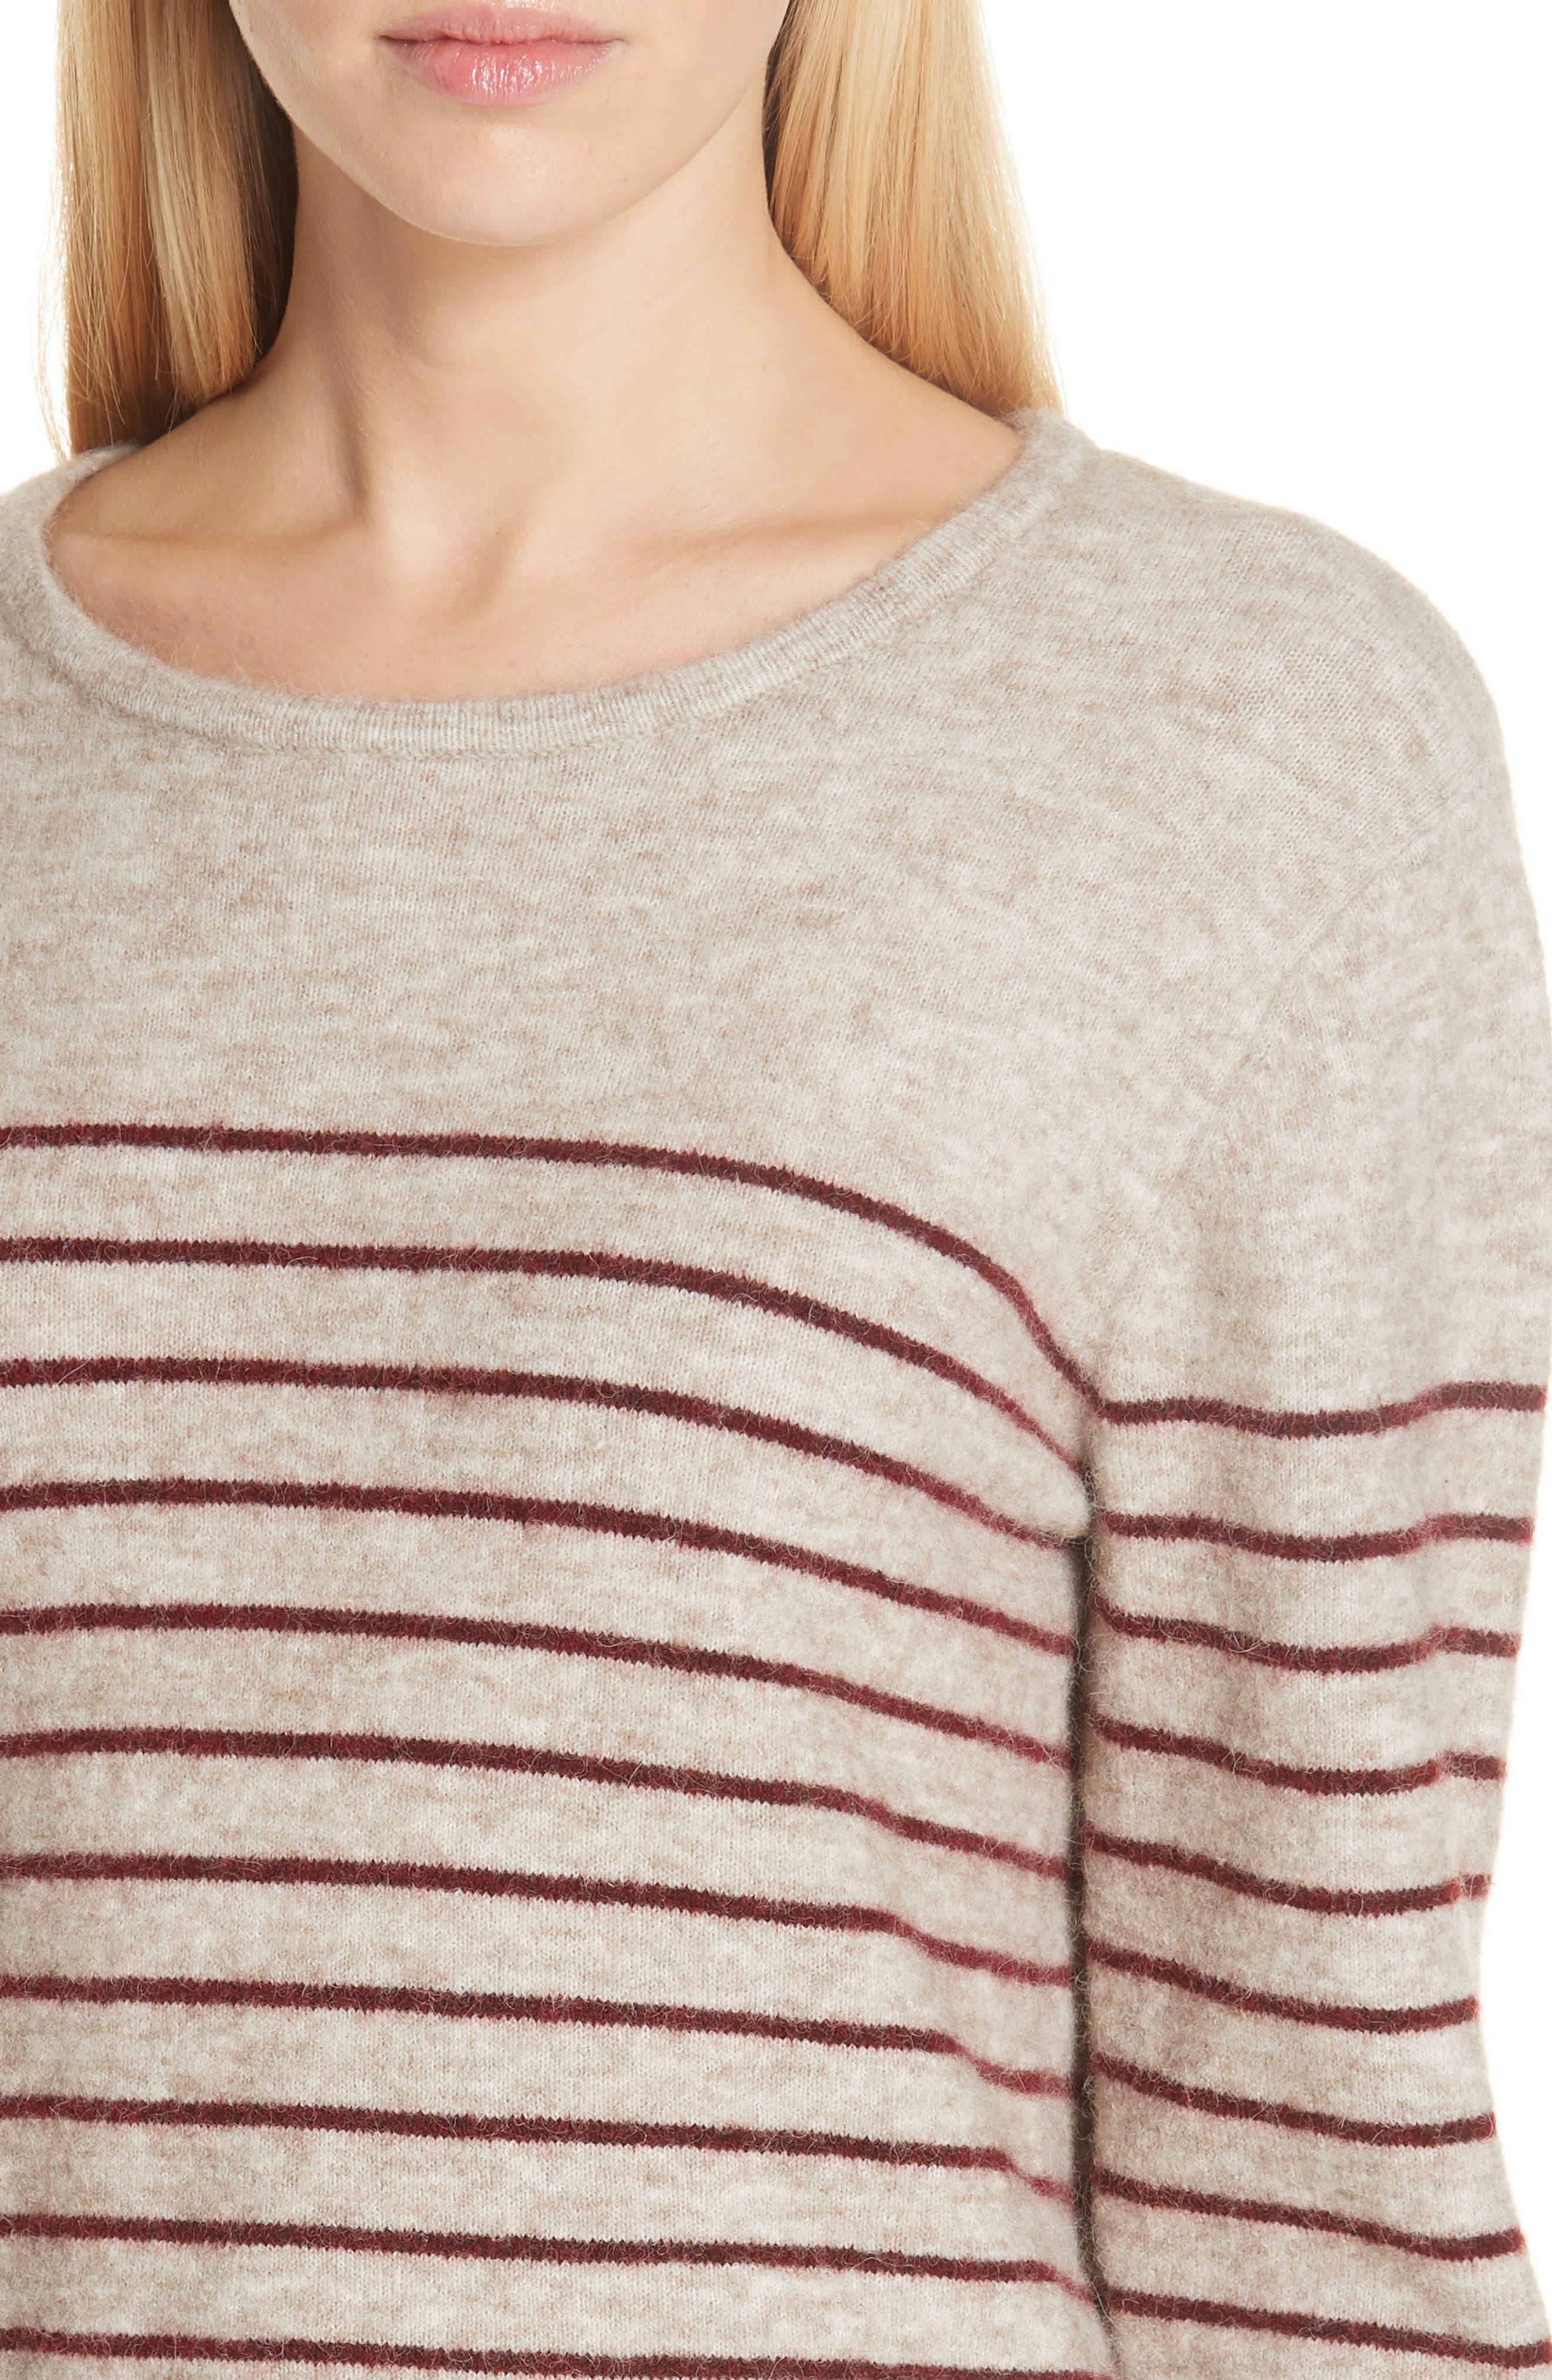 Artaud Stripe Sweater,                             Alternate thumbnail 4, color,                             BEIGE